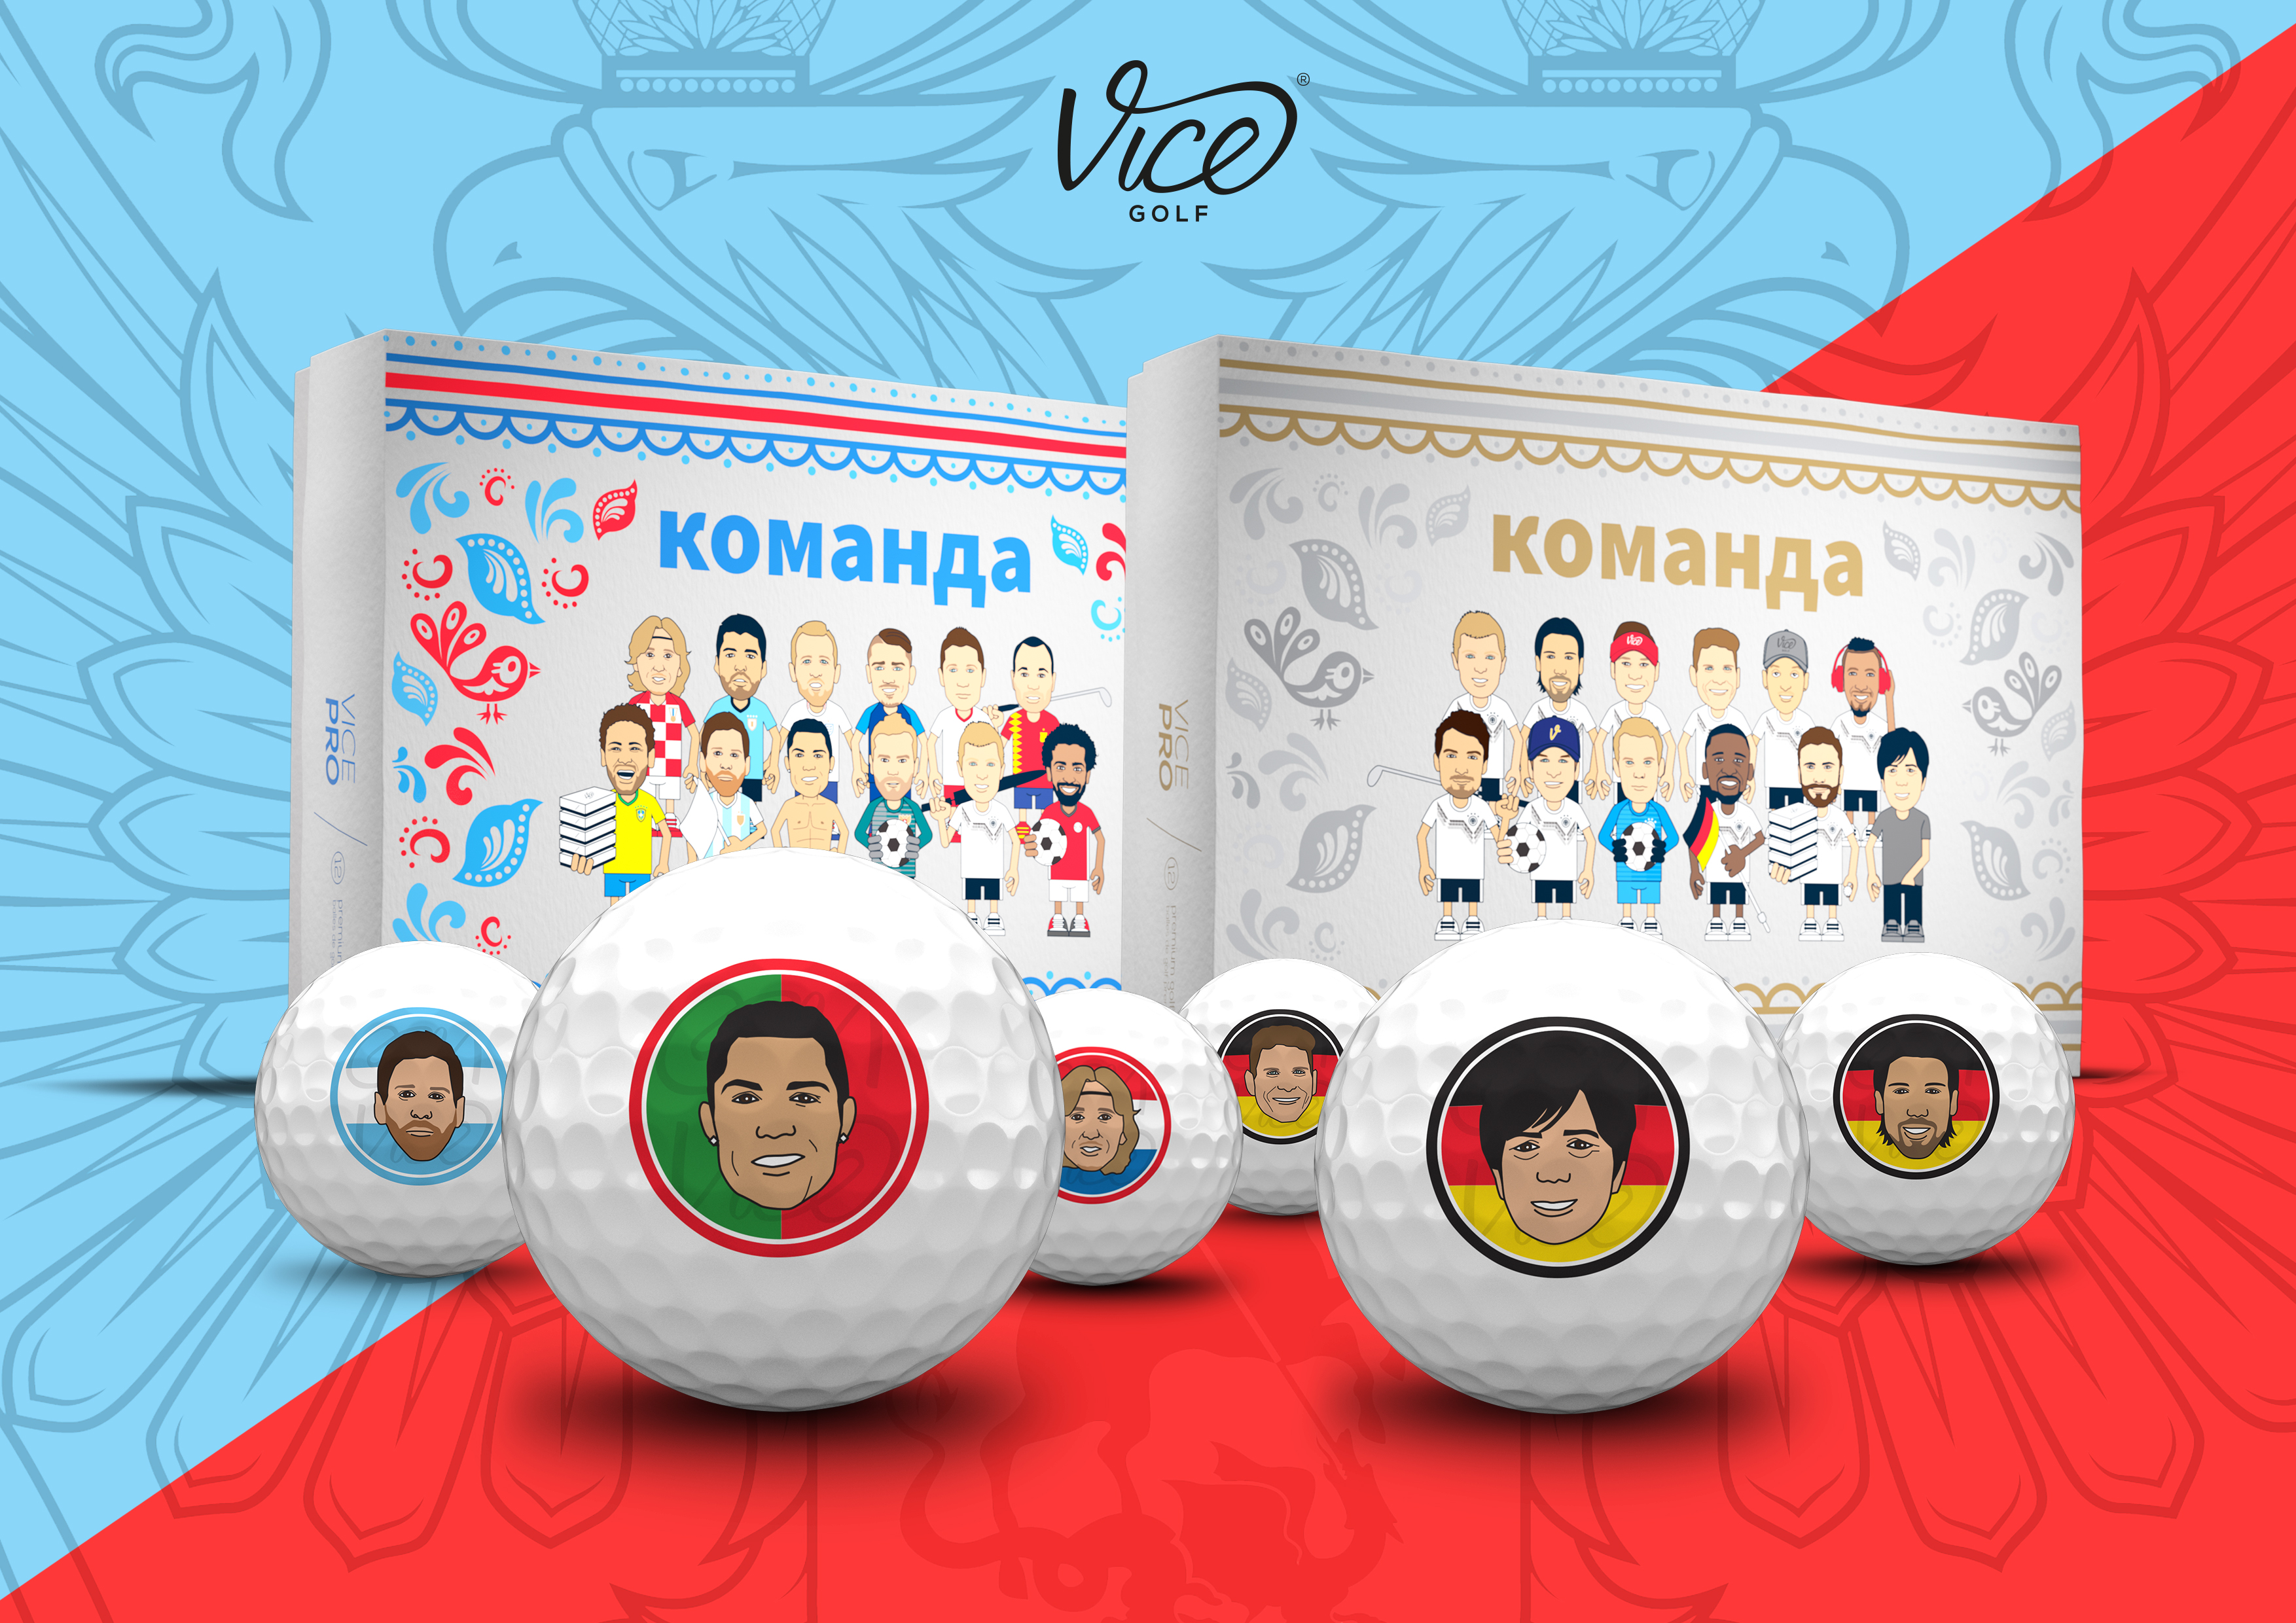 Vice launch World Cup golf balls